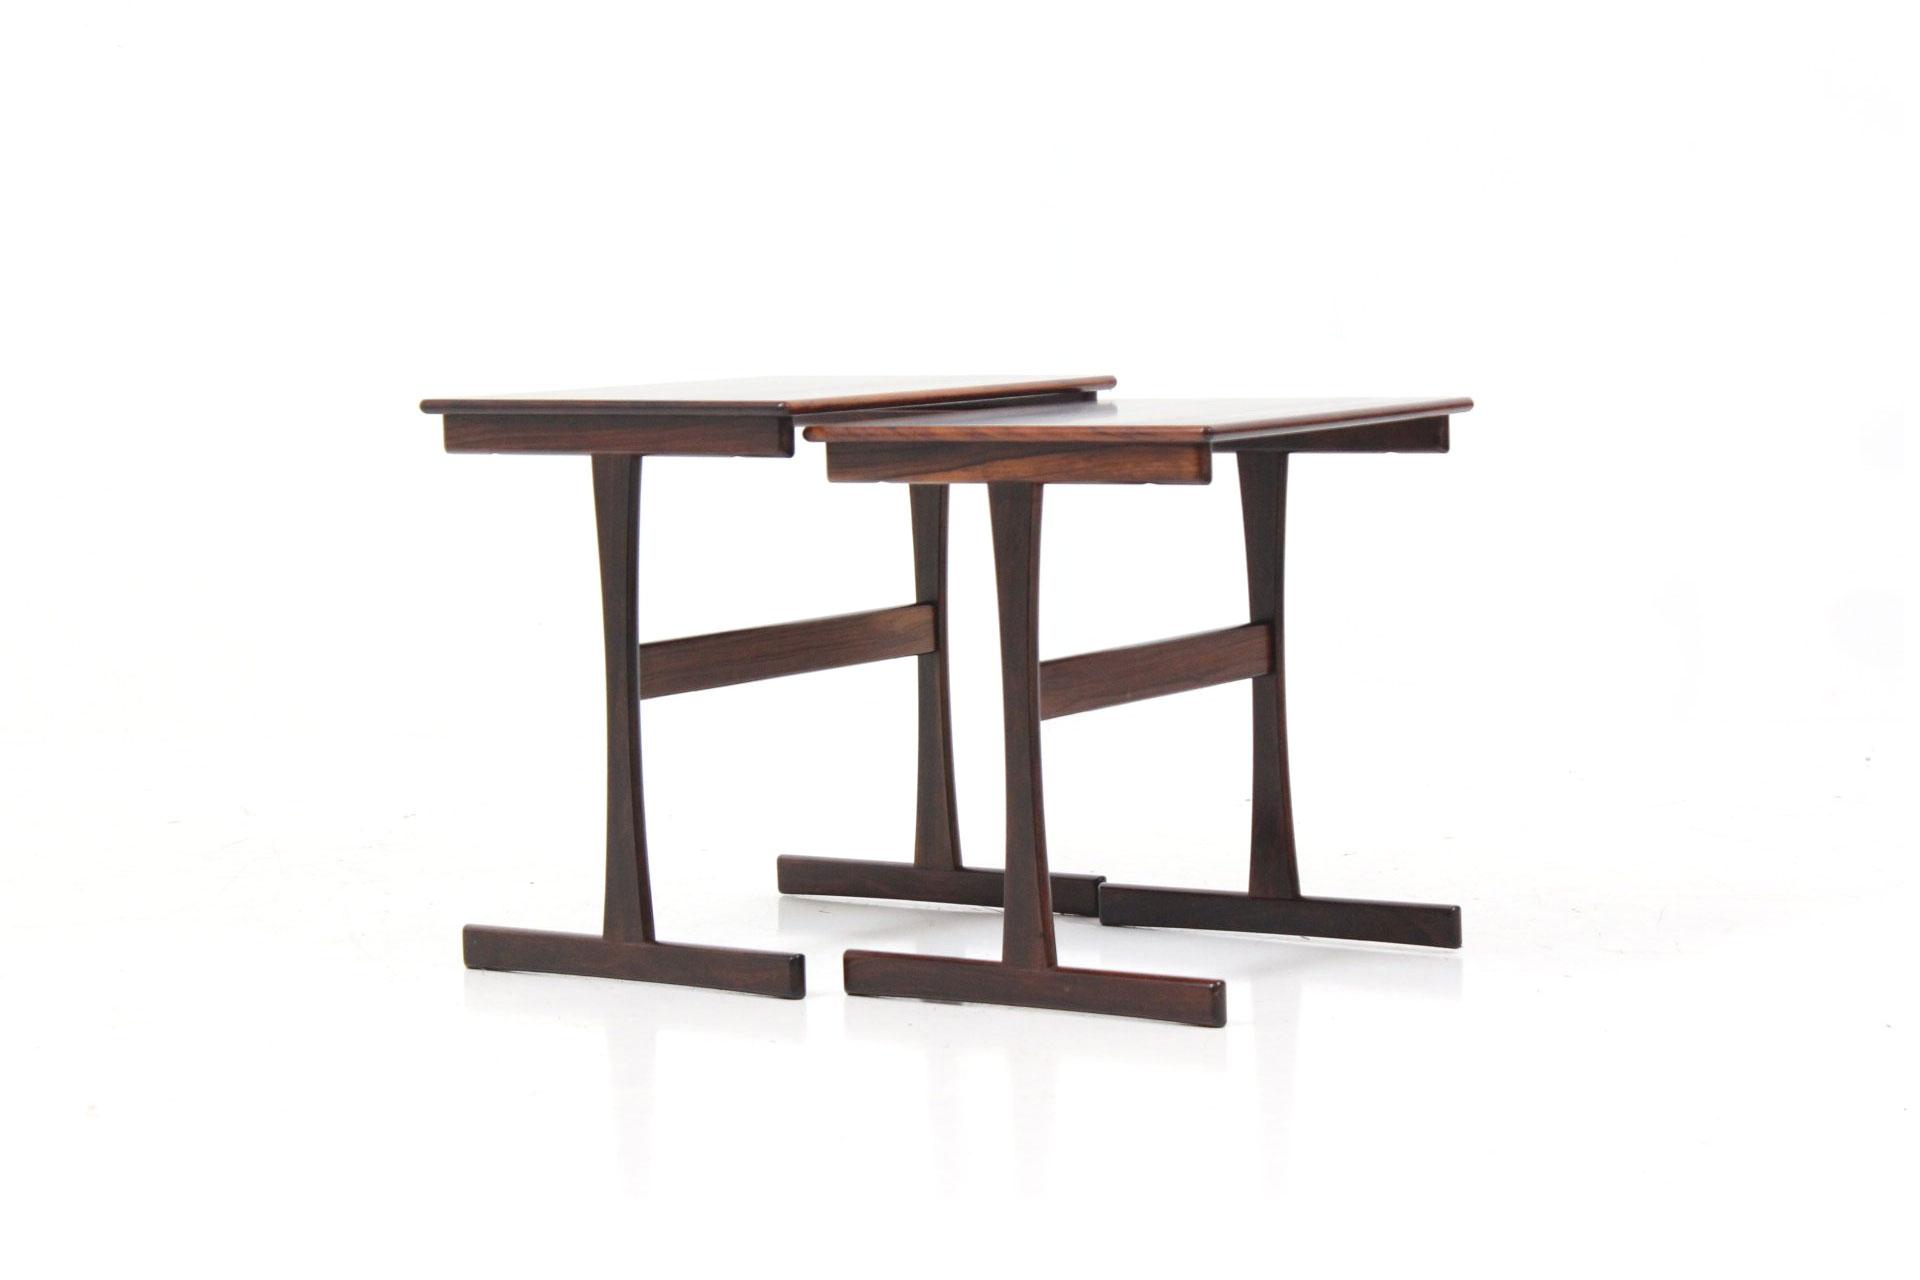 Retro Vintage Minimalist Nesting / Stacking Tables in Palisander